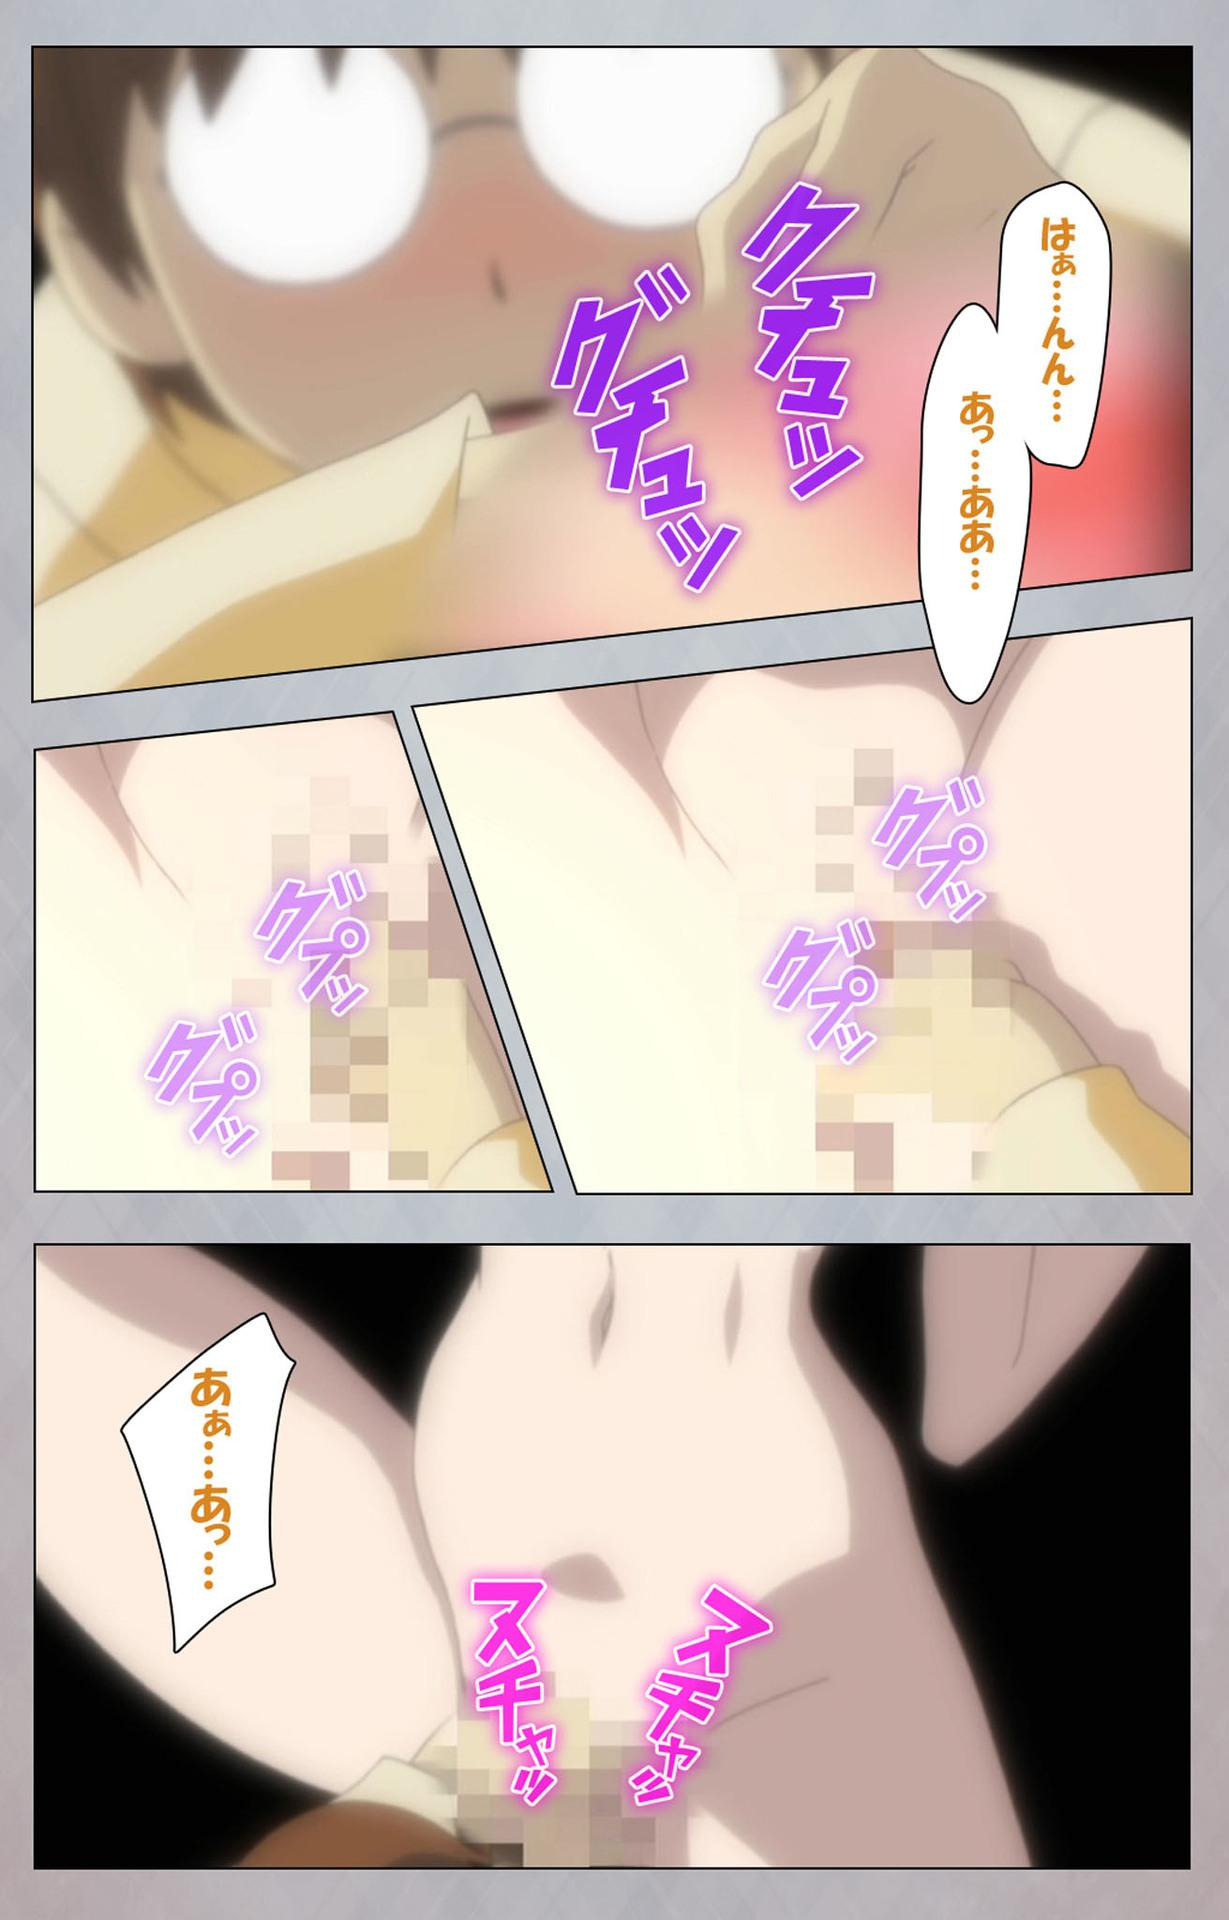 [Digital Works] [Full Color Seijin Ban] Sex Android ~Risou no Onna de Nuite yaru~ Kanzenban 82